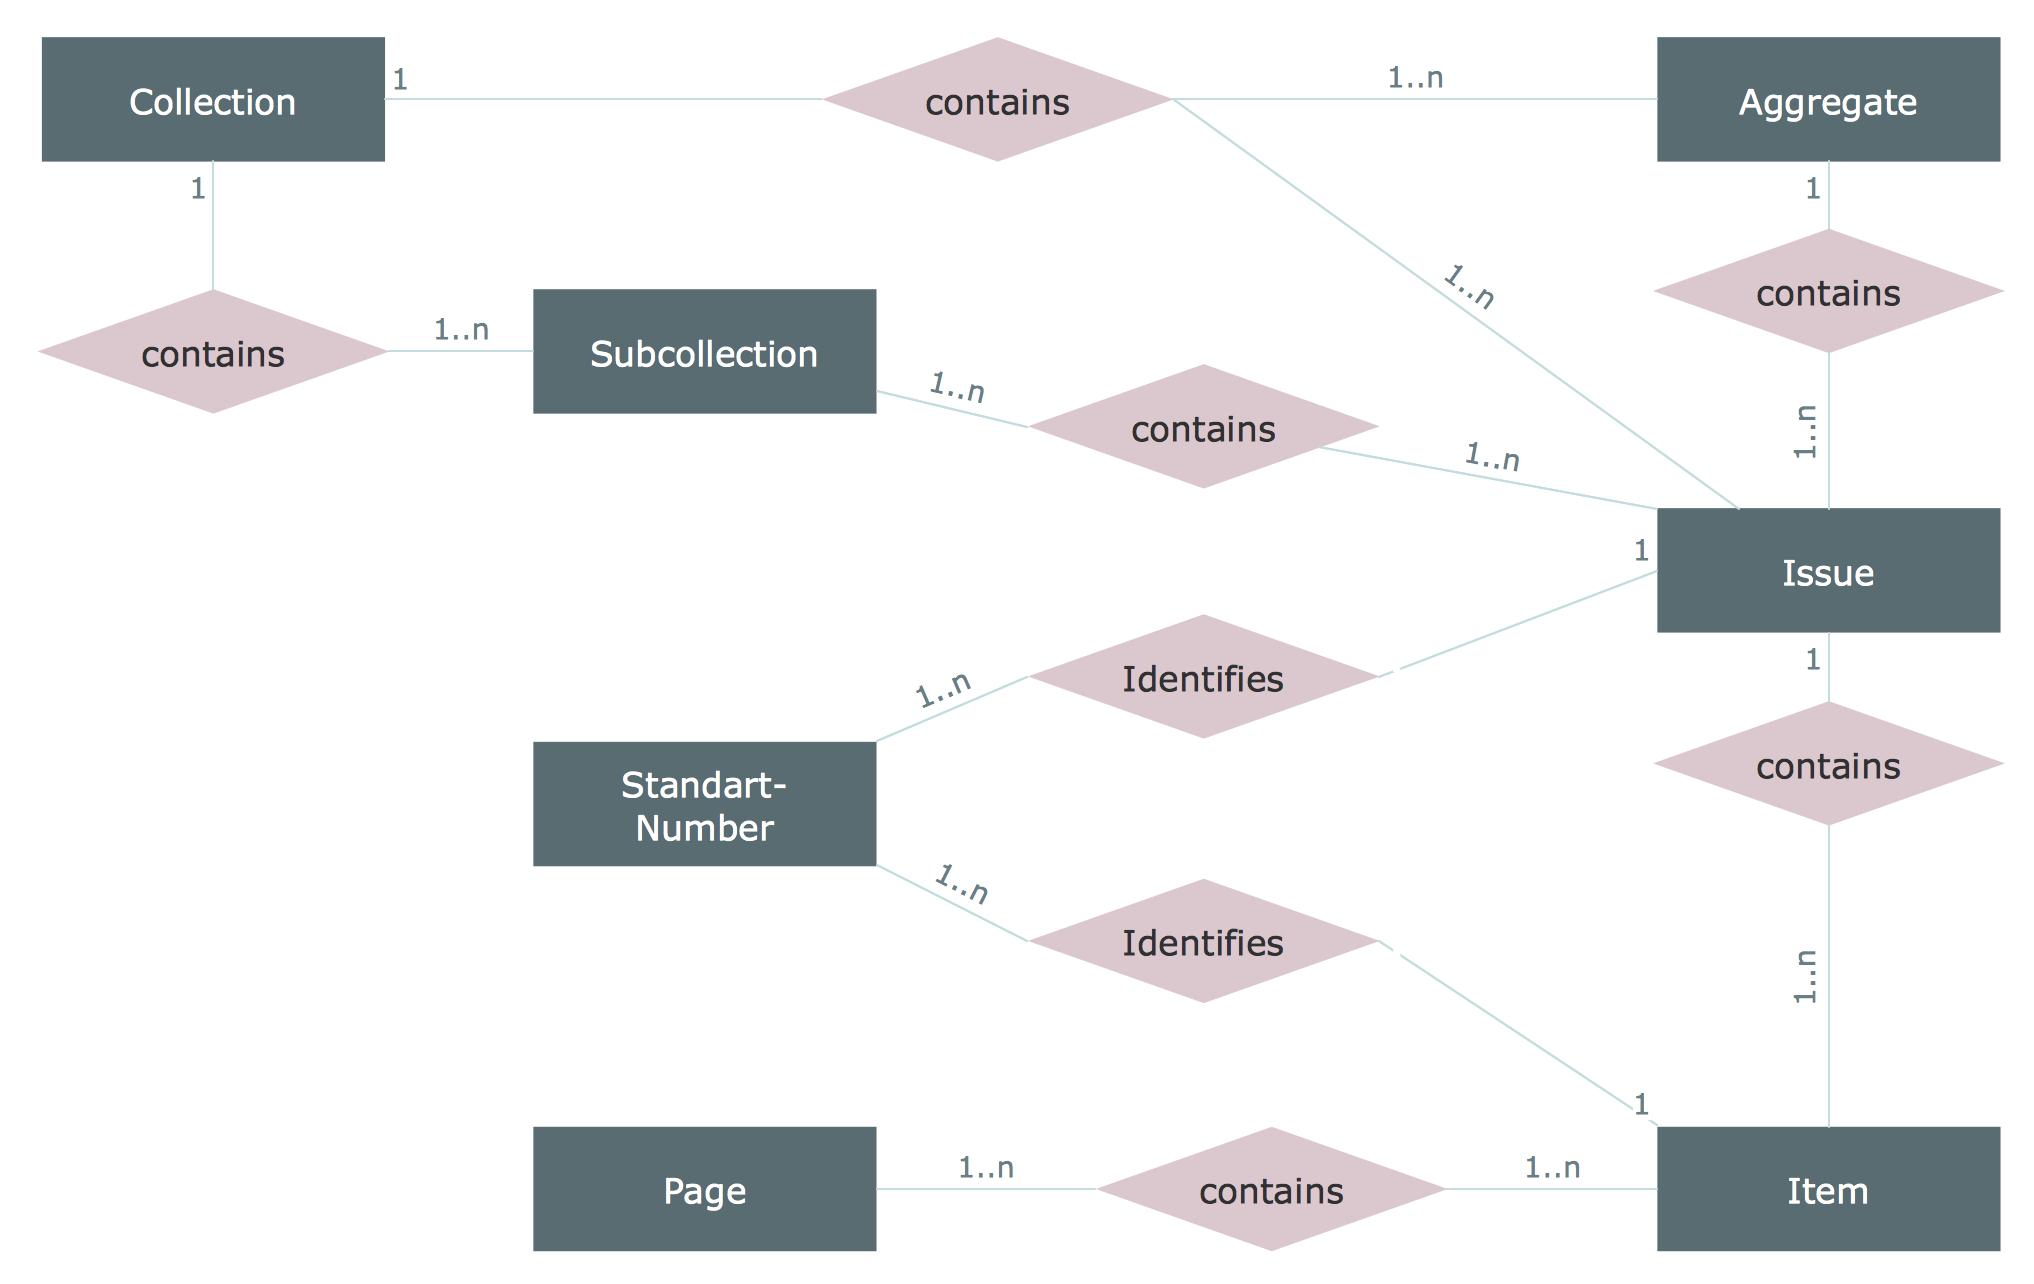 Entity Relationship Diagram (Erd) Solution | Conceptdraw regarding The Entity Relationship Diagram